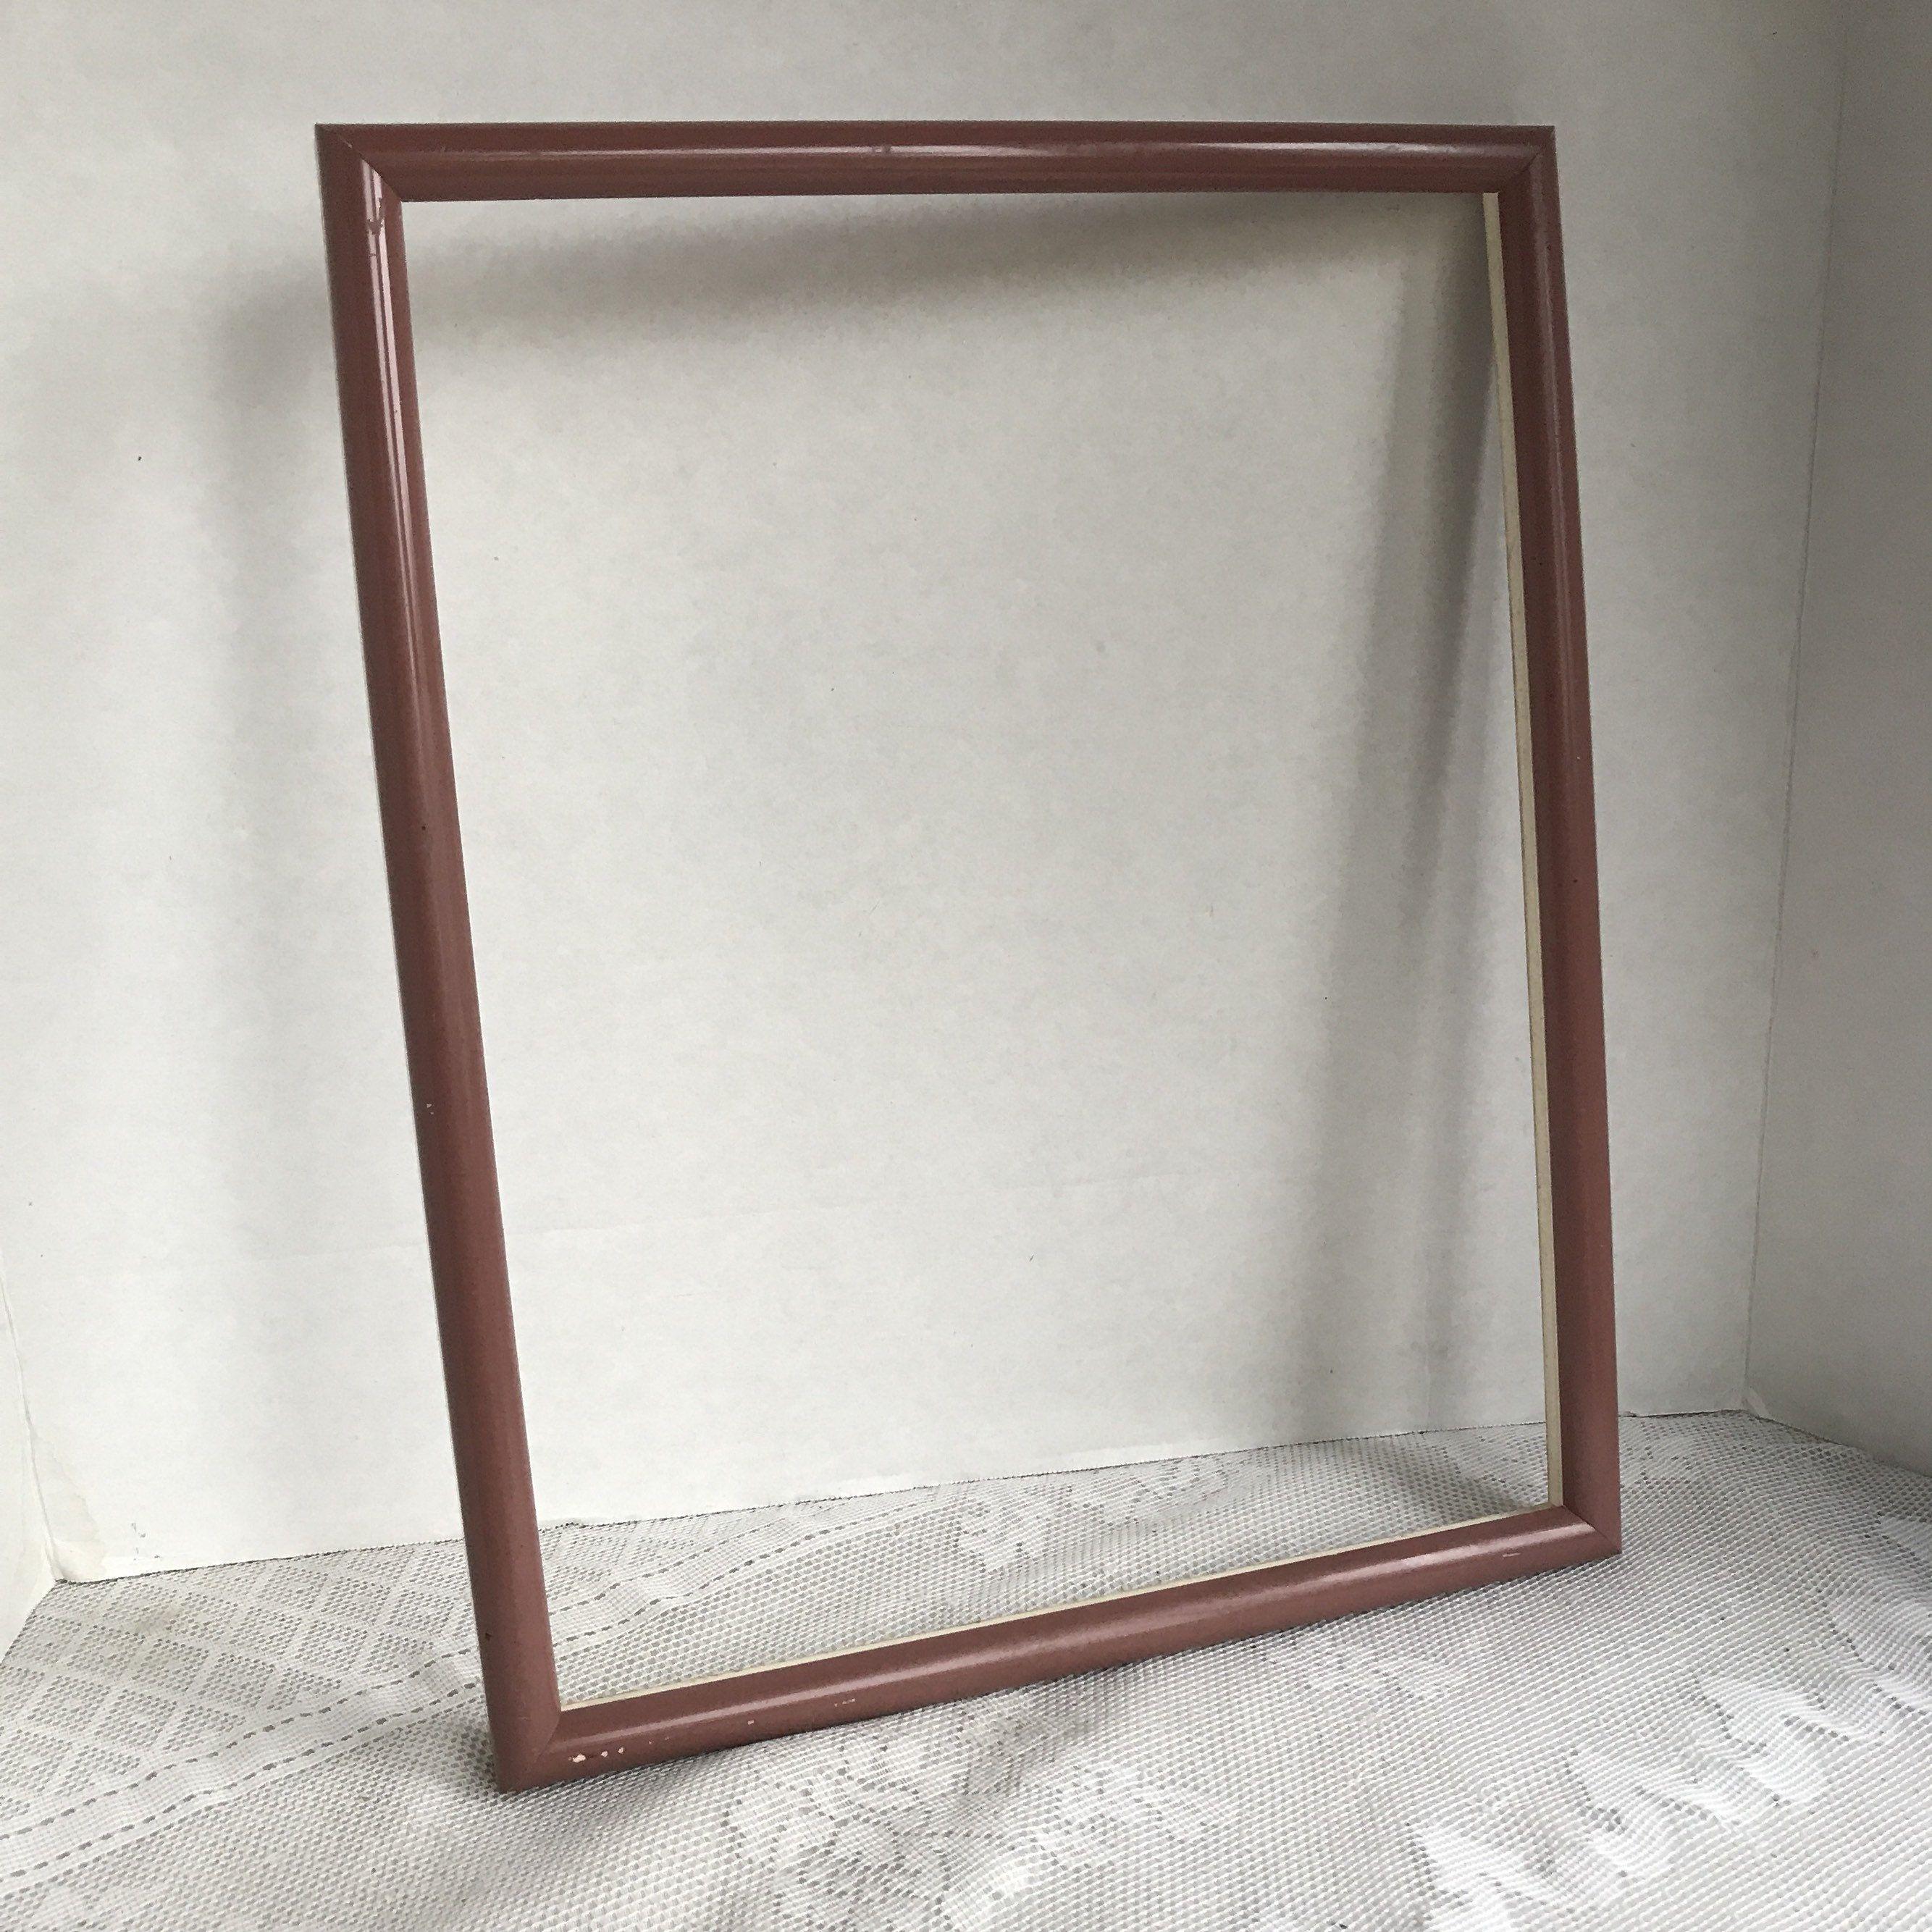 Vintage Pressed Wood Picture Frame Pink Wooden 11 X 14 Inch Frame Wood Picture Frames Picture On Wood Picture Frames